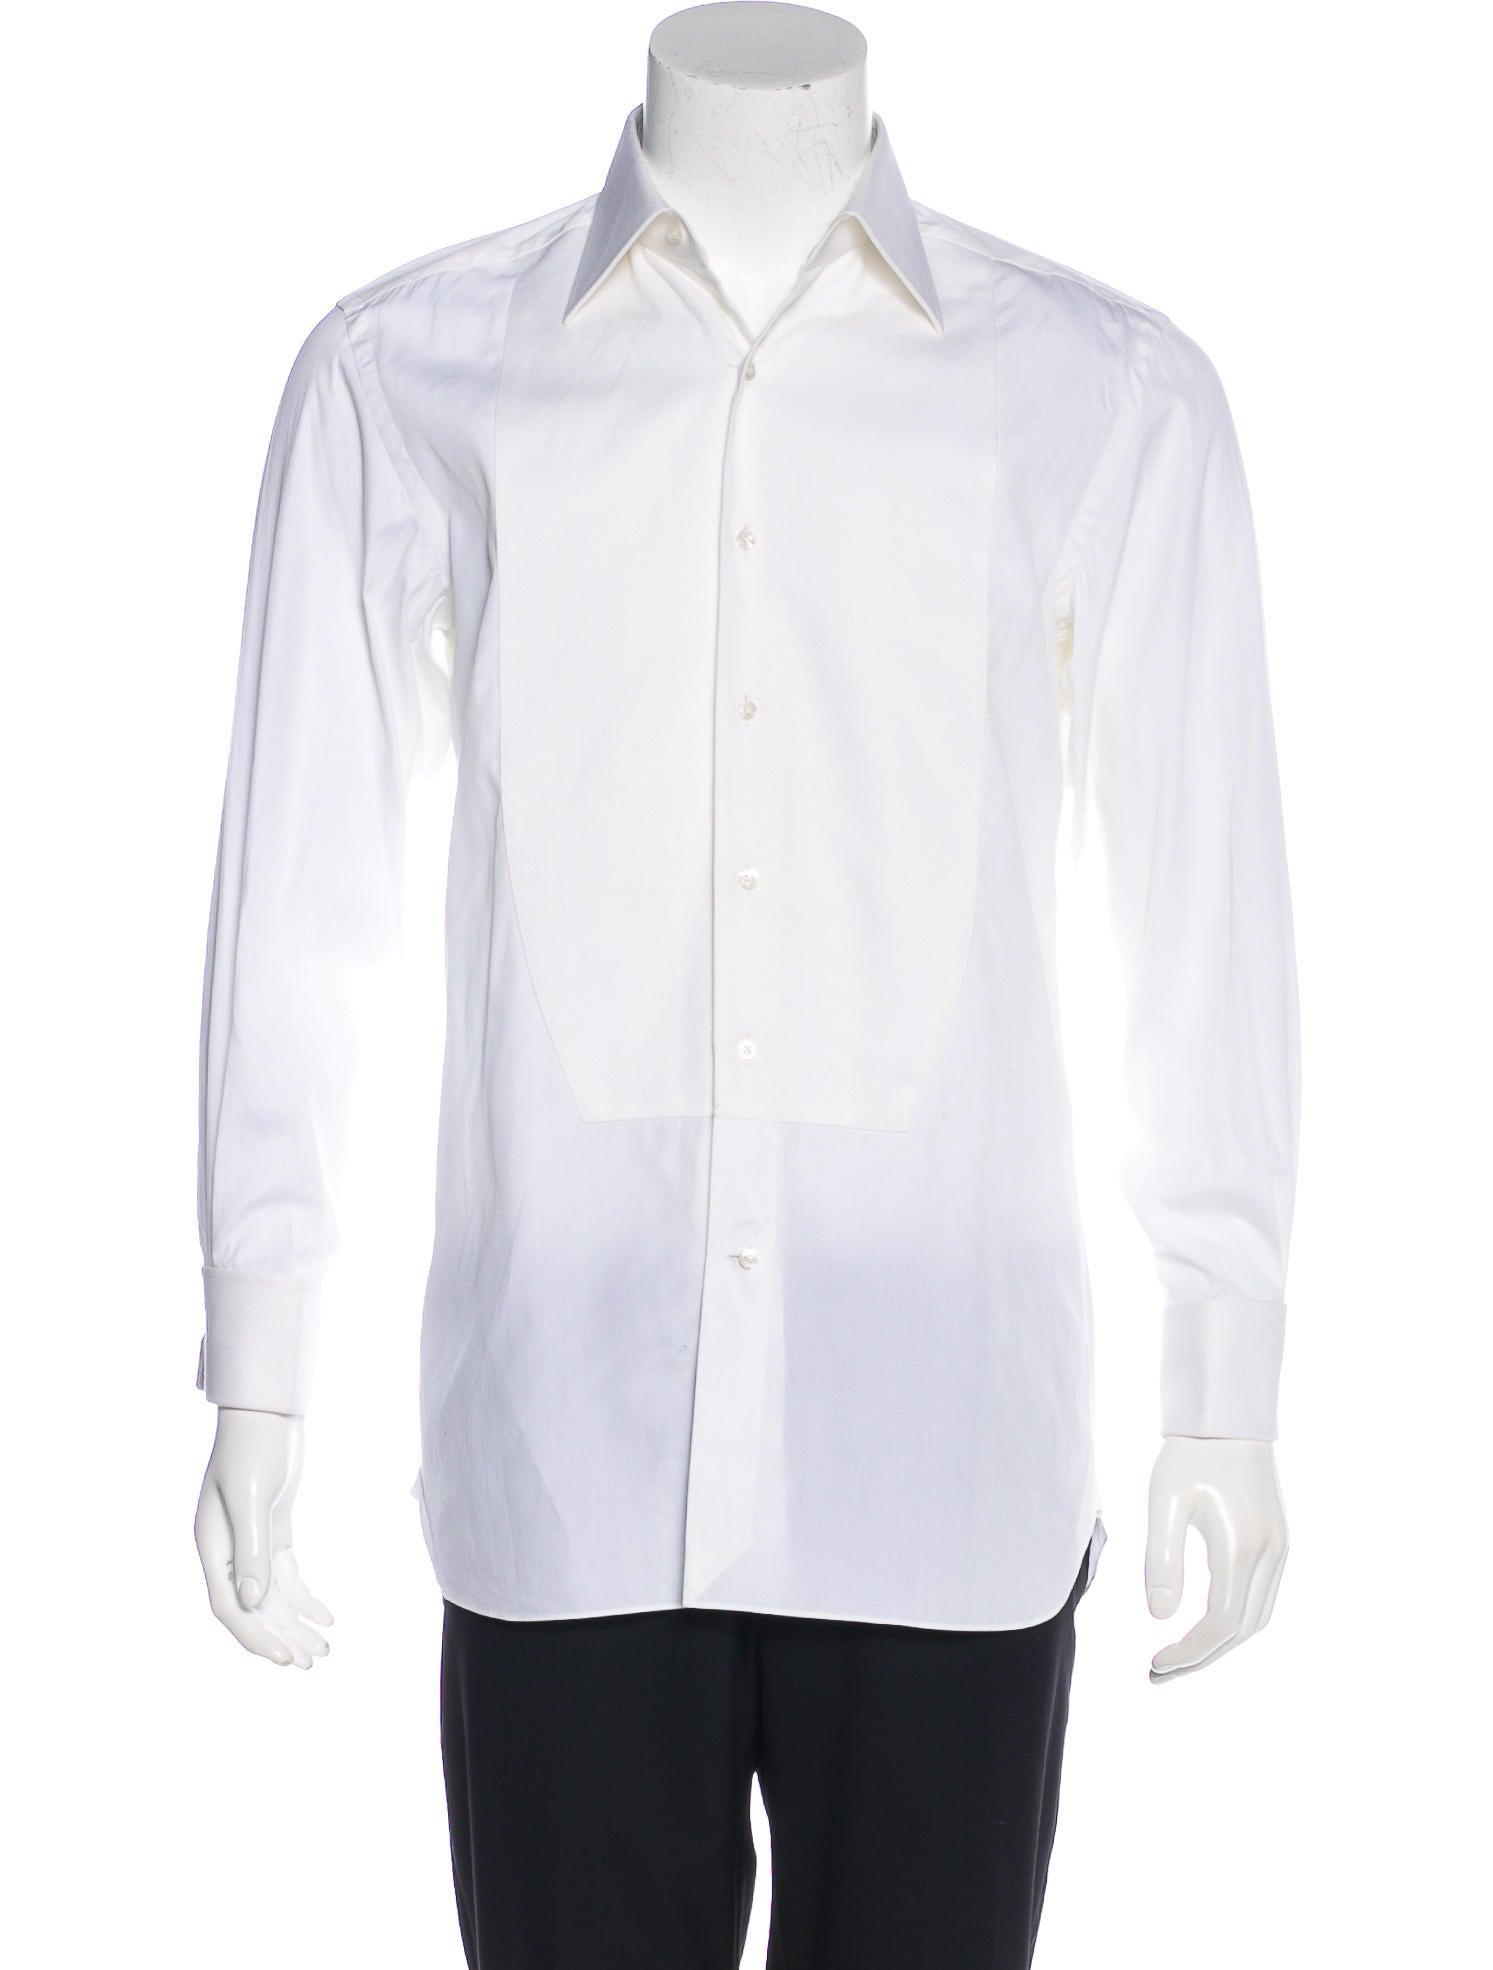 Tom ford french cuff tuxedo shirt clothing tom36632 for Tuxedo shirt french cuff